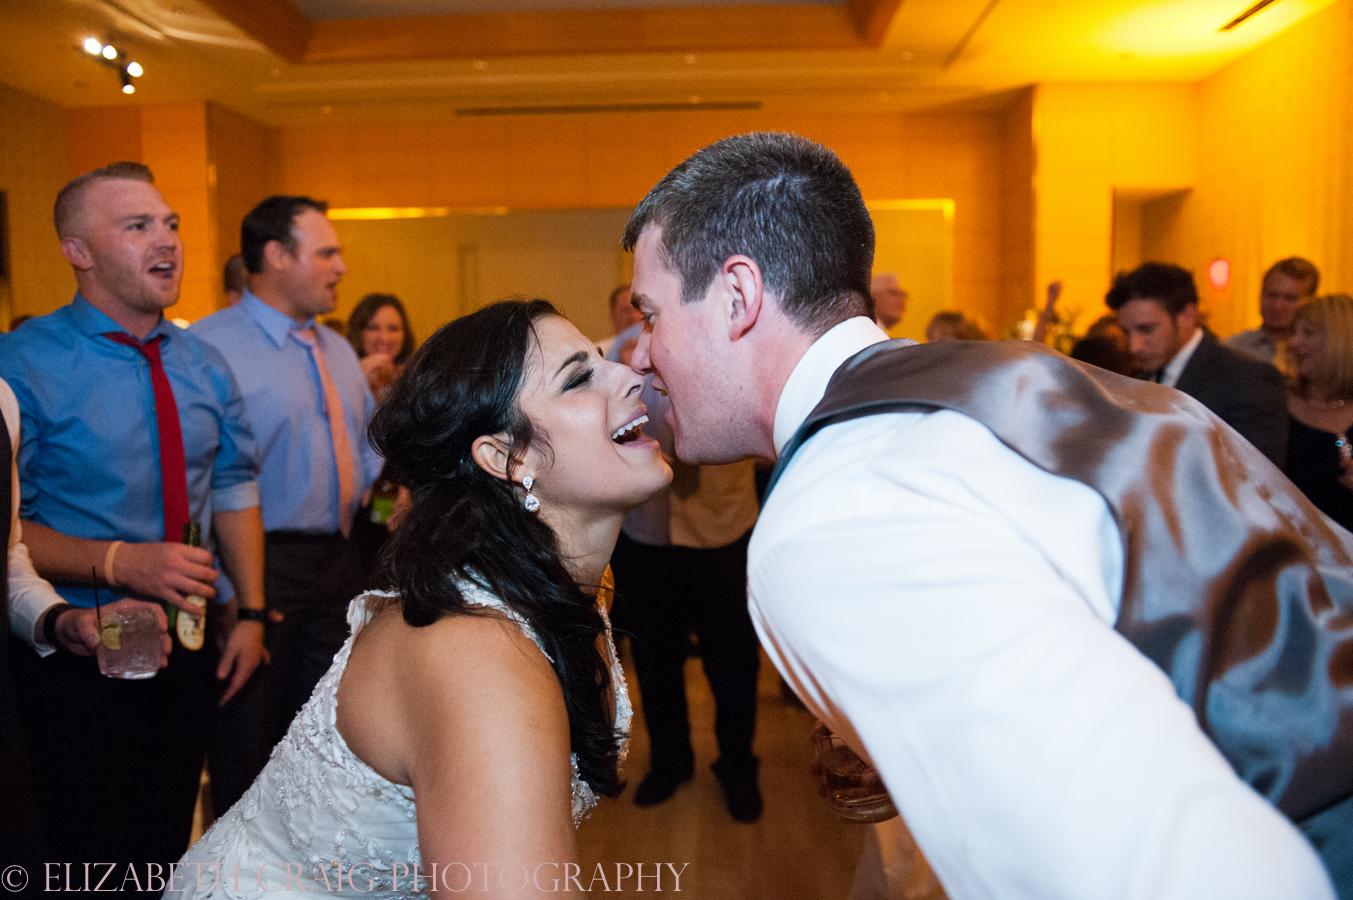 pittsburgh-greek-weddings-fairmont-weddings-receptions-elizabeth-craig-photohgraphy-033